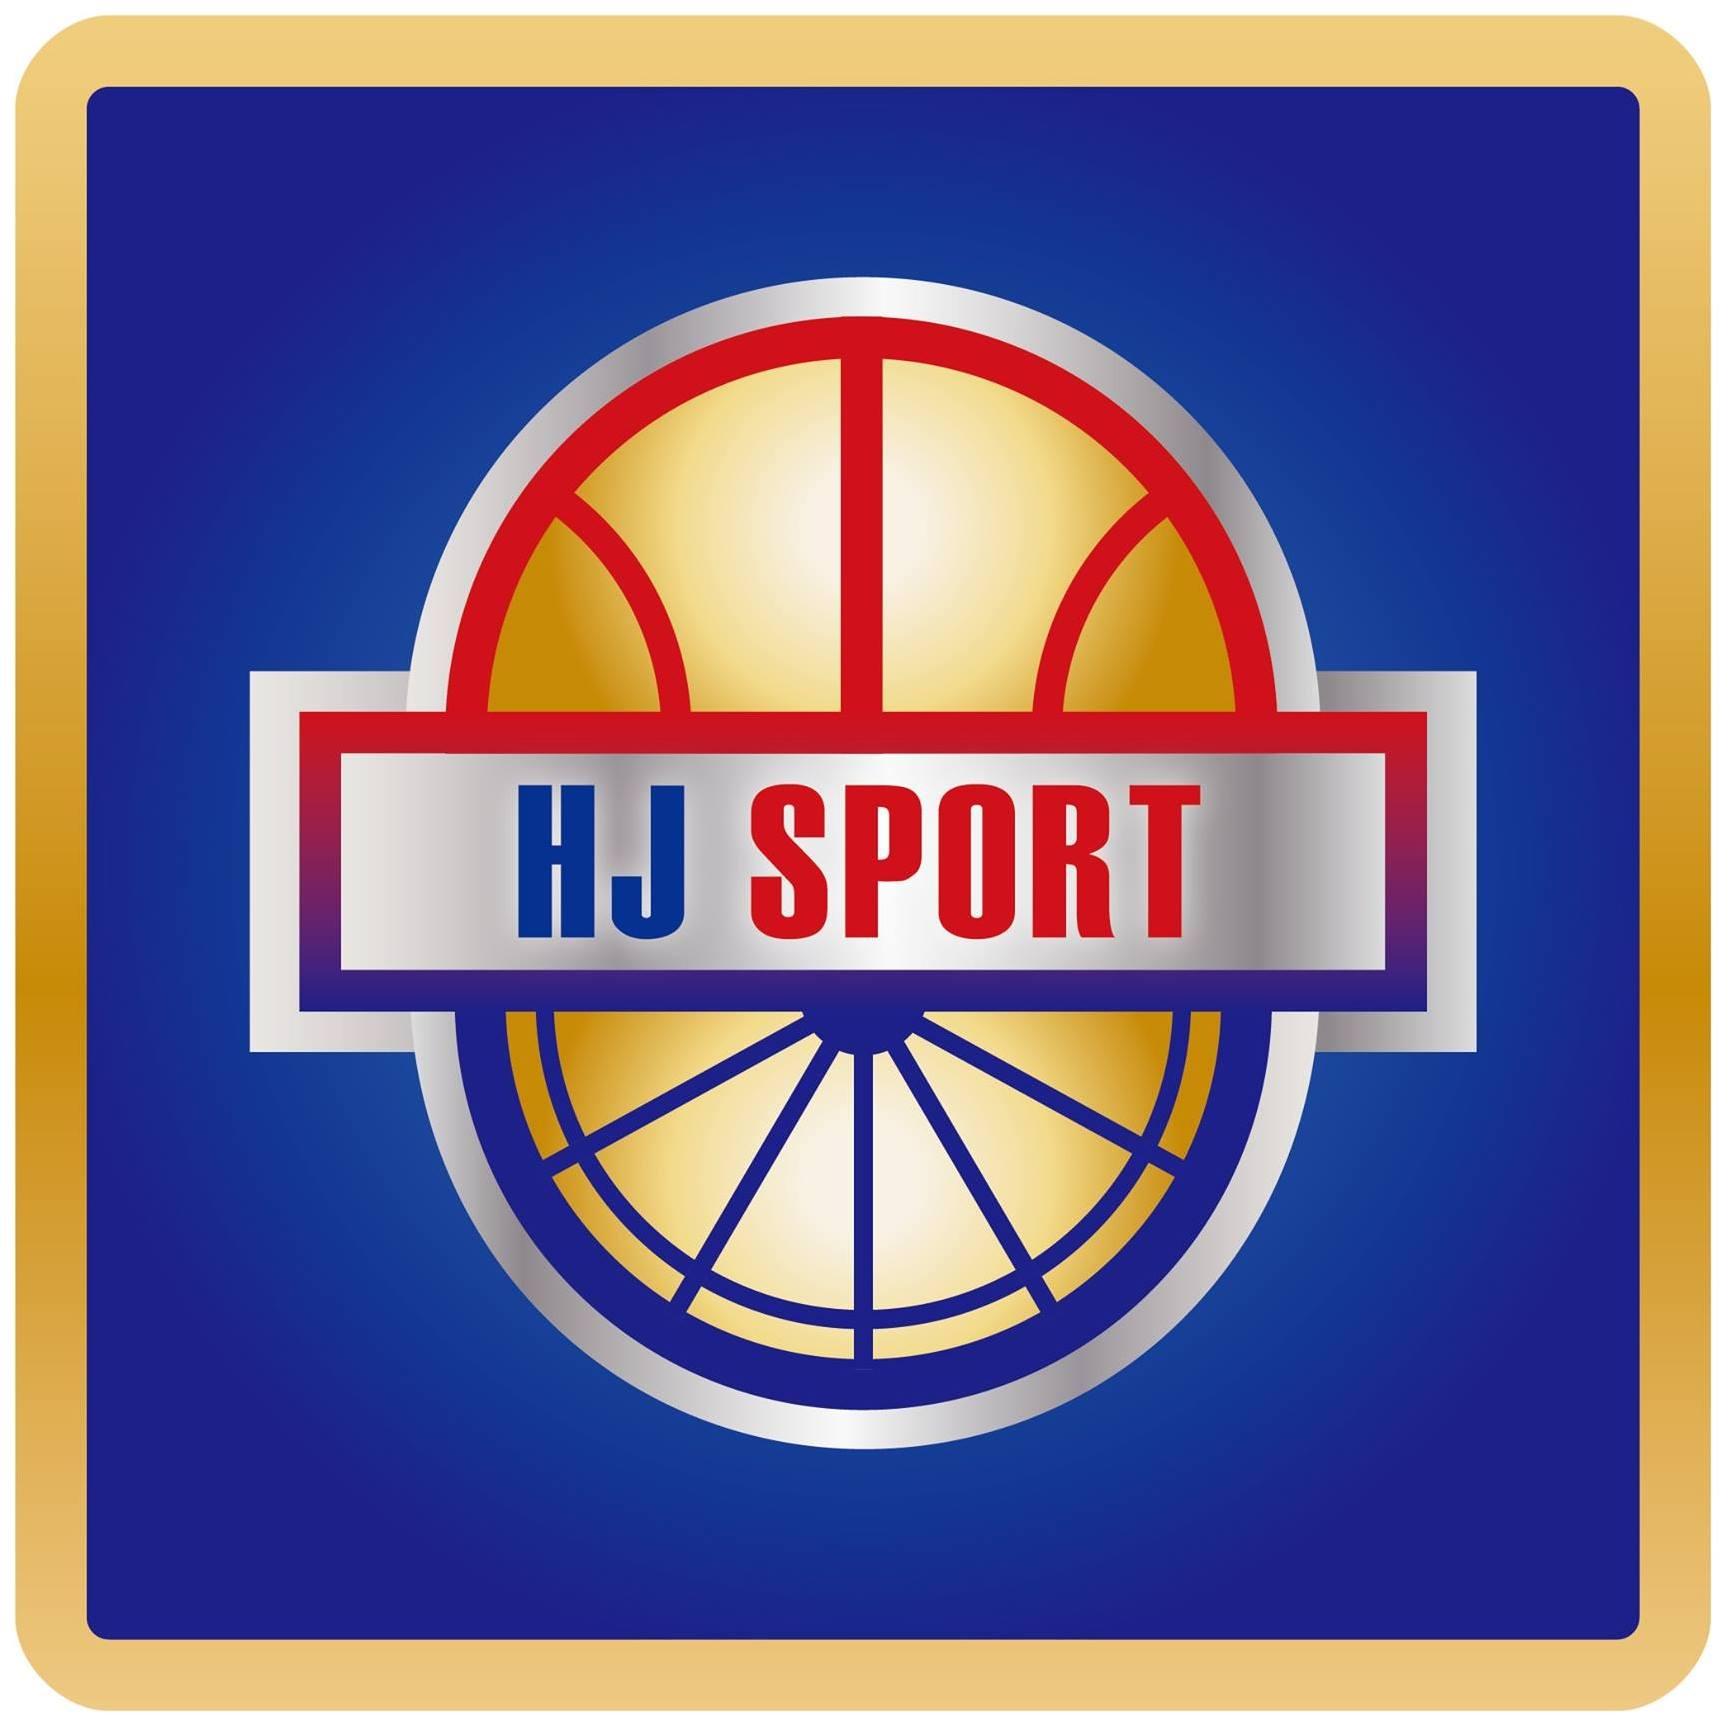 Yahoo奇摩運動 (HJ Sports)